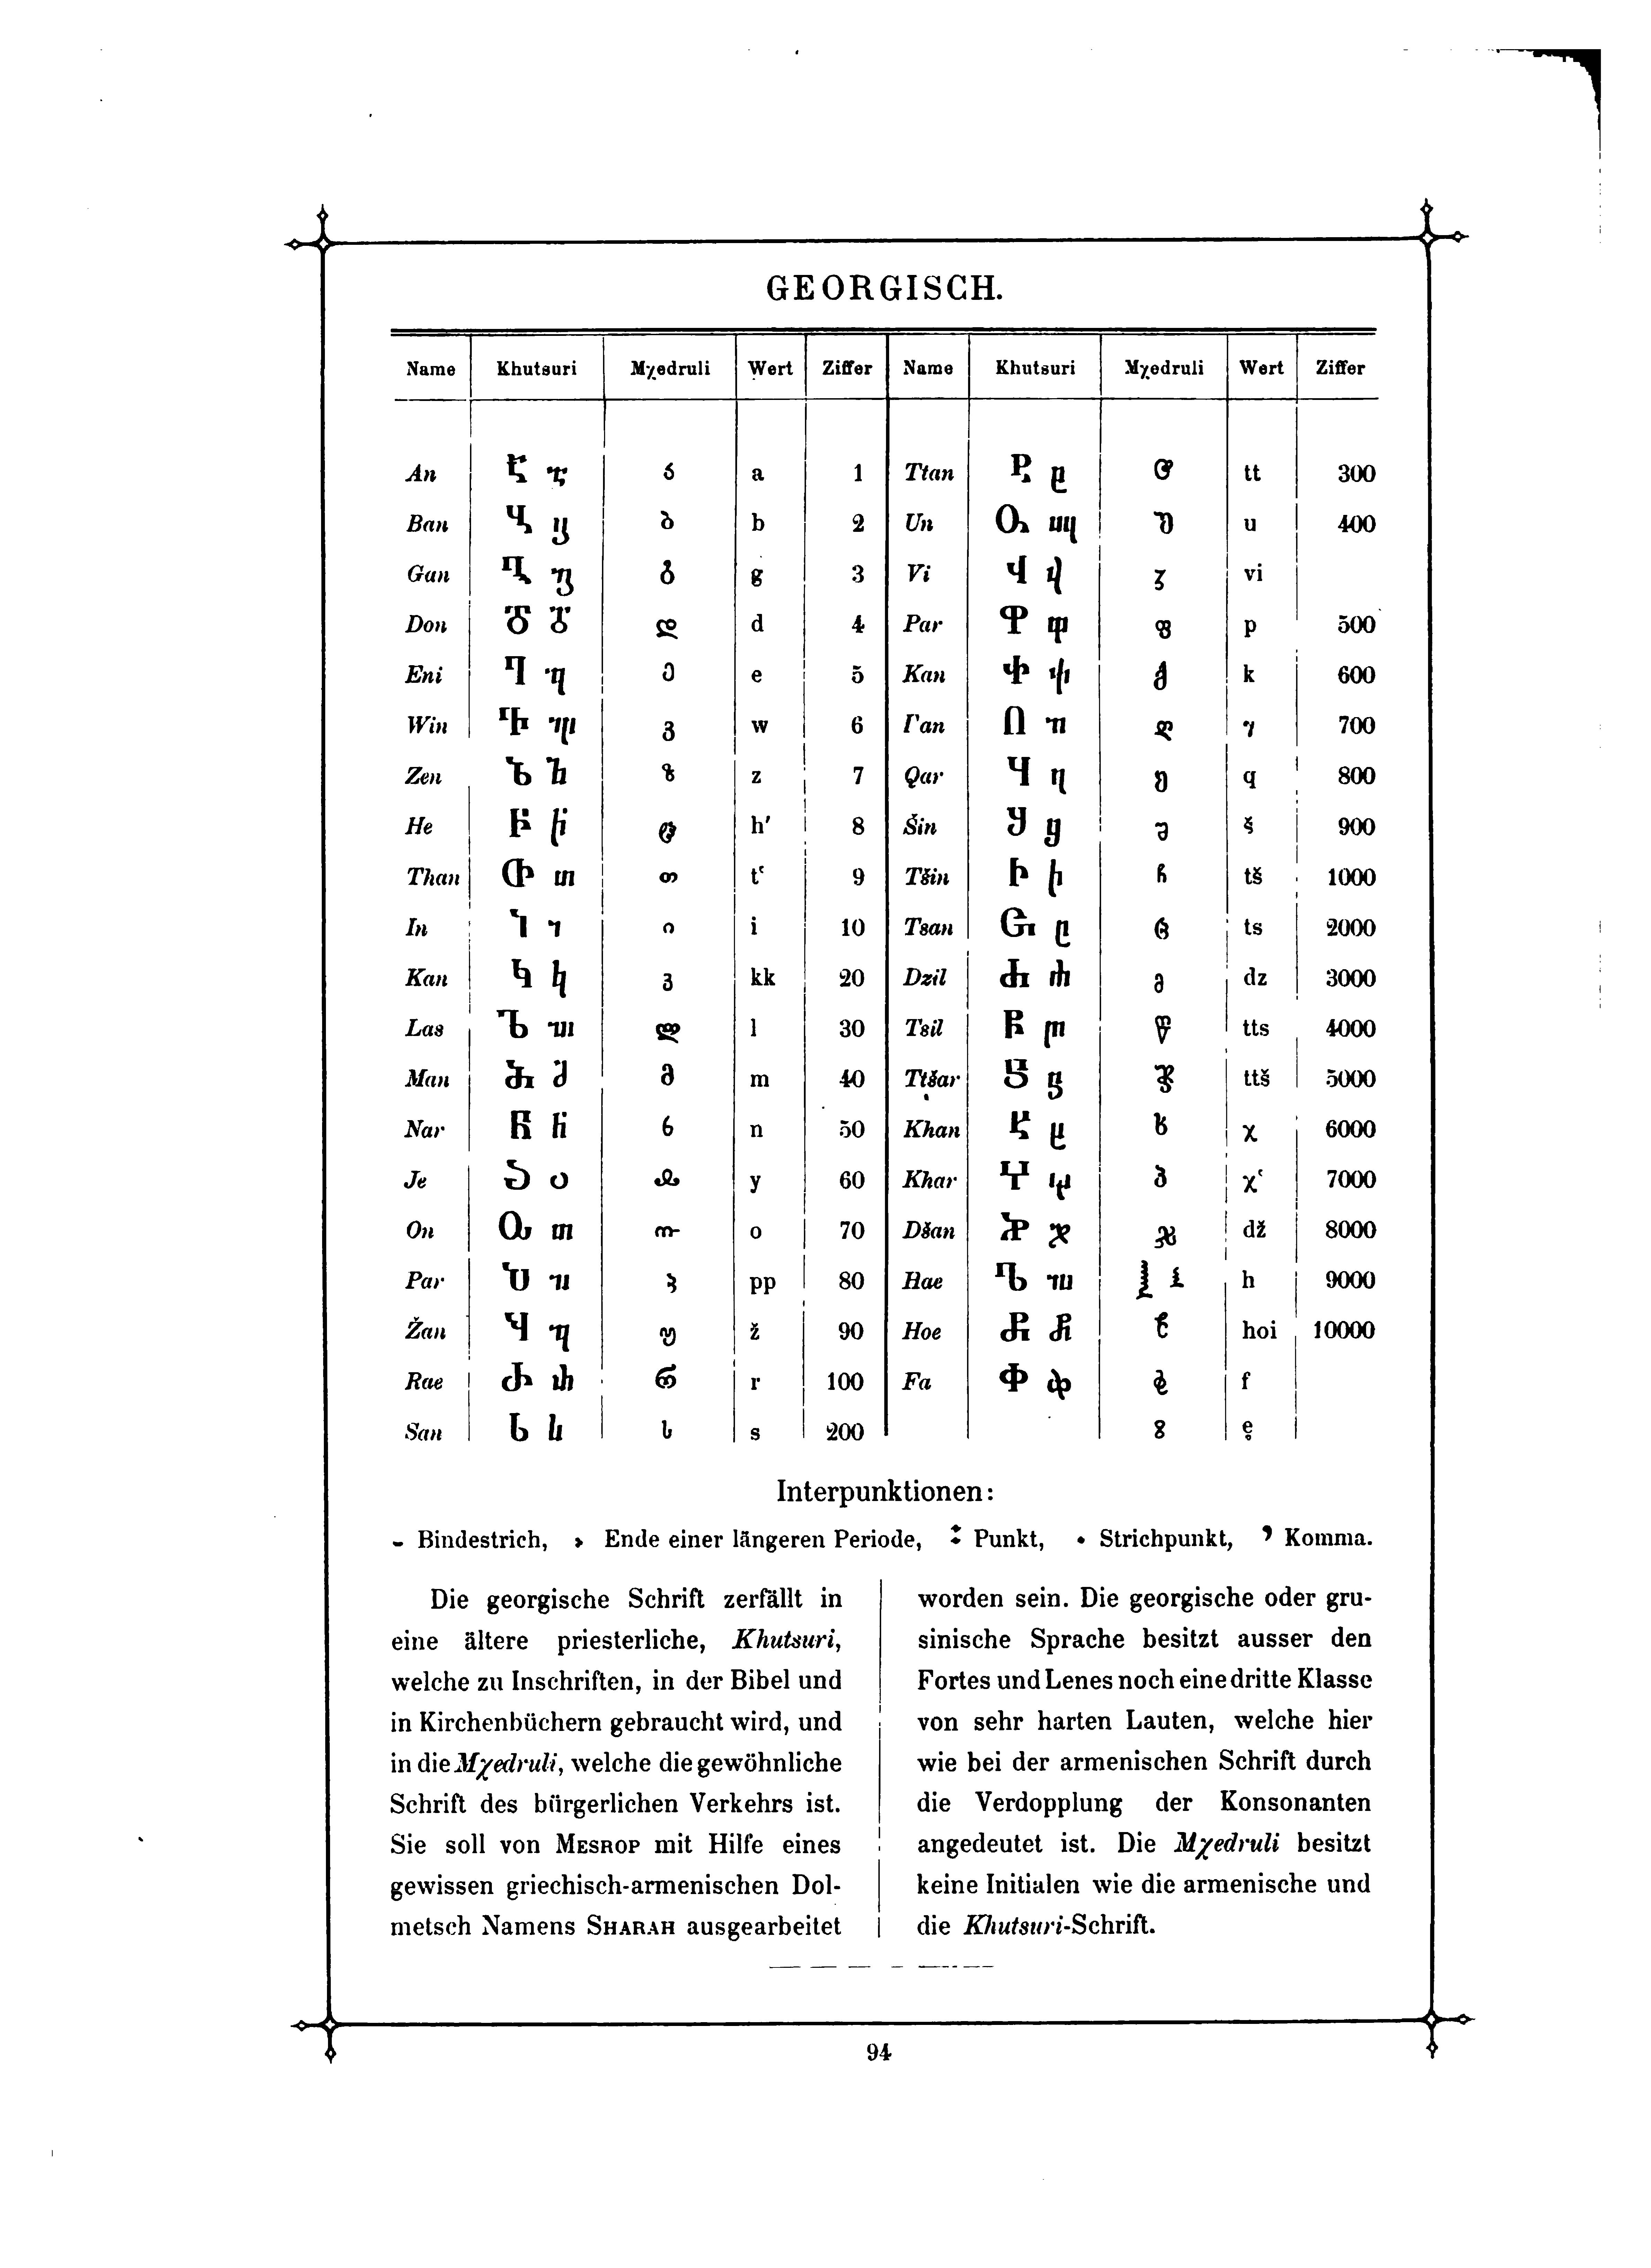 Das_Buch_der_Schrift_(Faulmann)_109.jpg